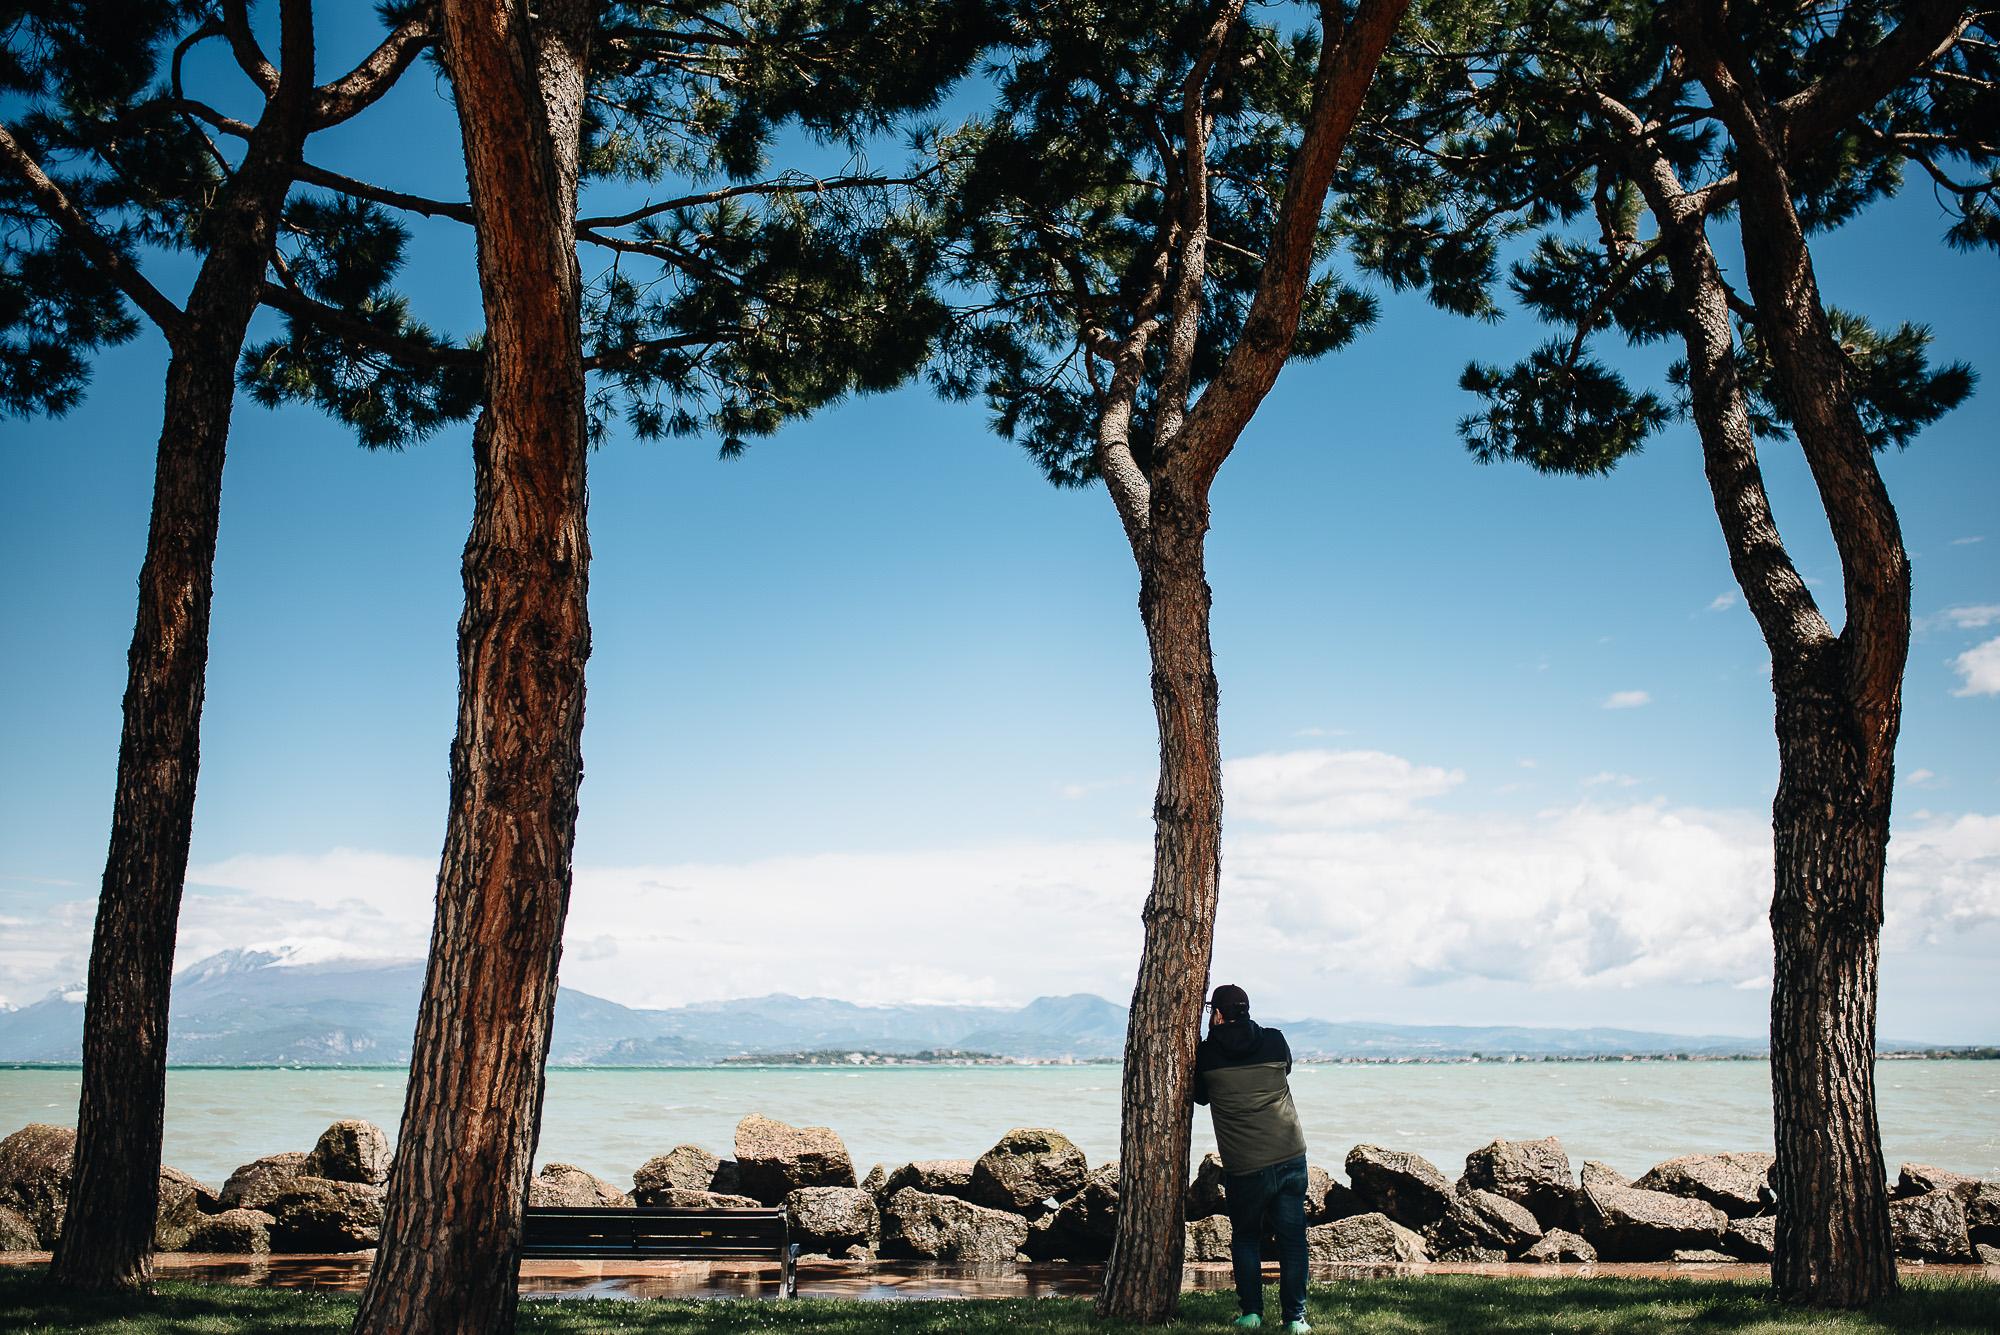 OurBeautifulAdventure-LakeGarda-Italy-Blog-1426.jpg